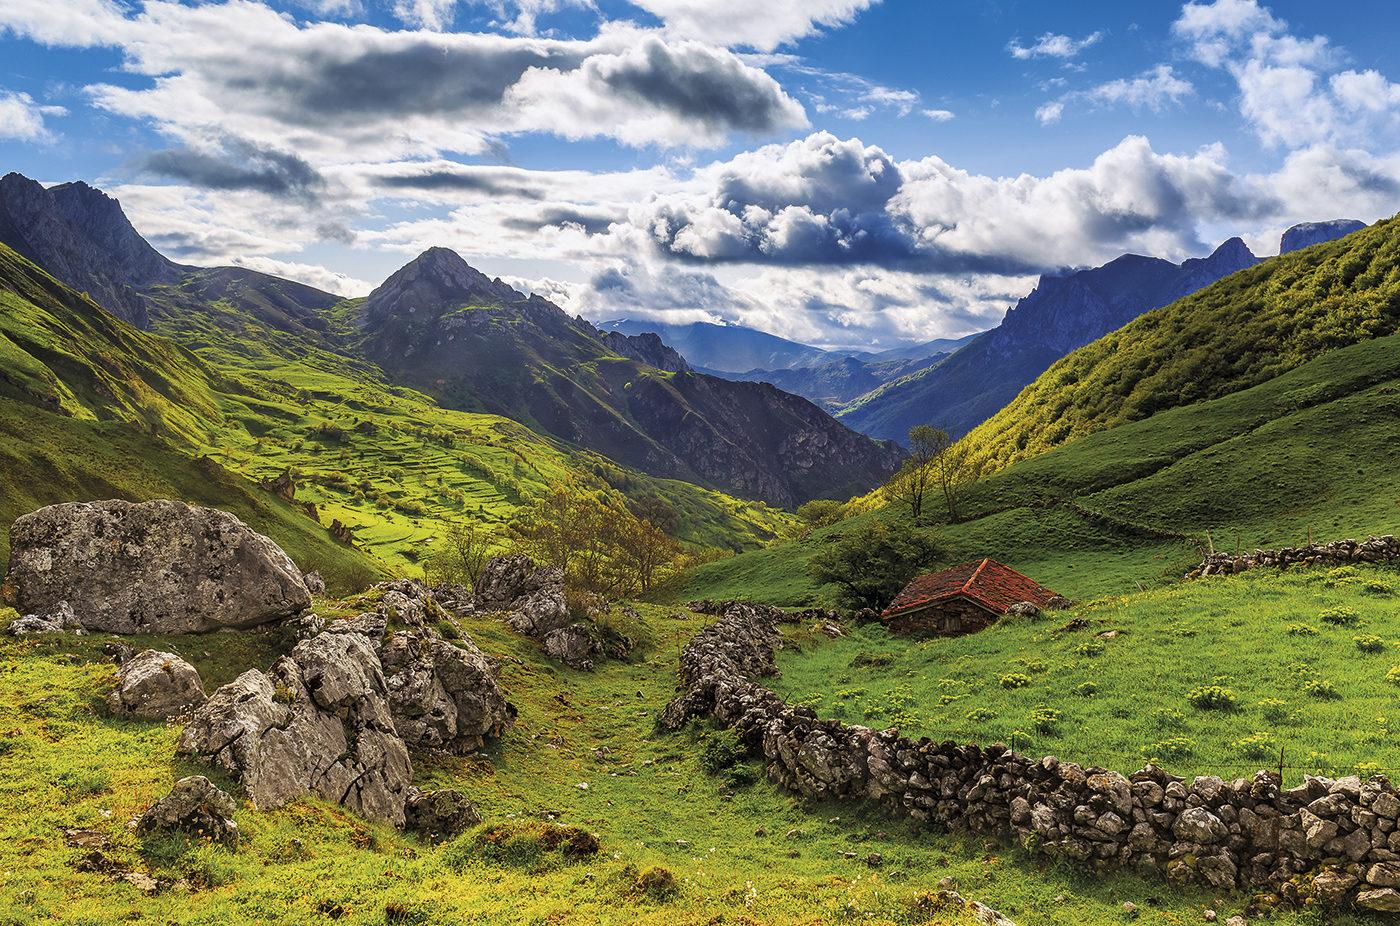 degañaparque e1587382281170 - Fuentes del Narcea, Degaña e Ibias Natural Park-Asturias-Spain